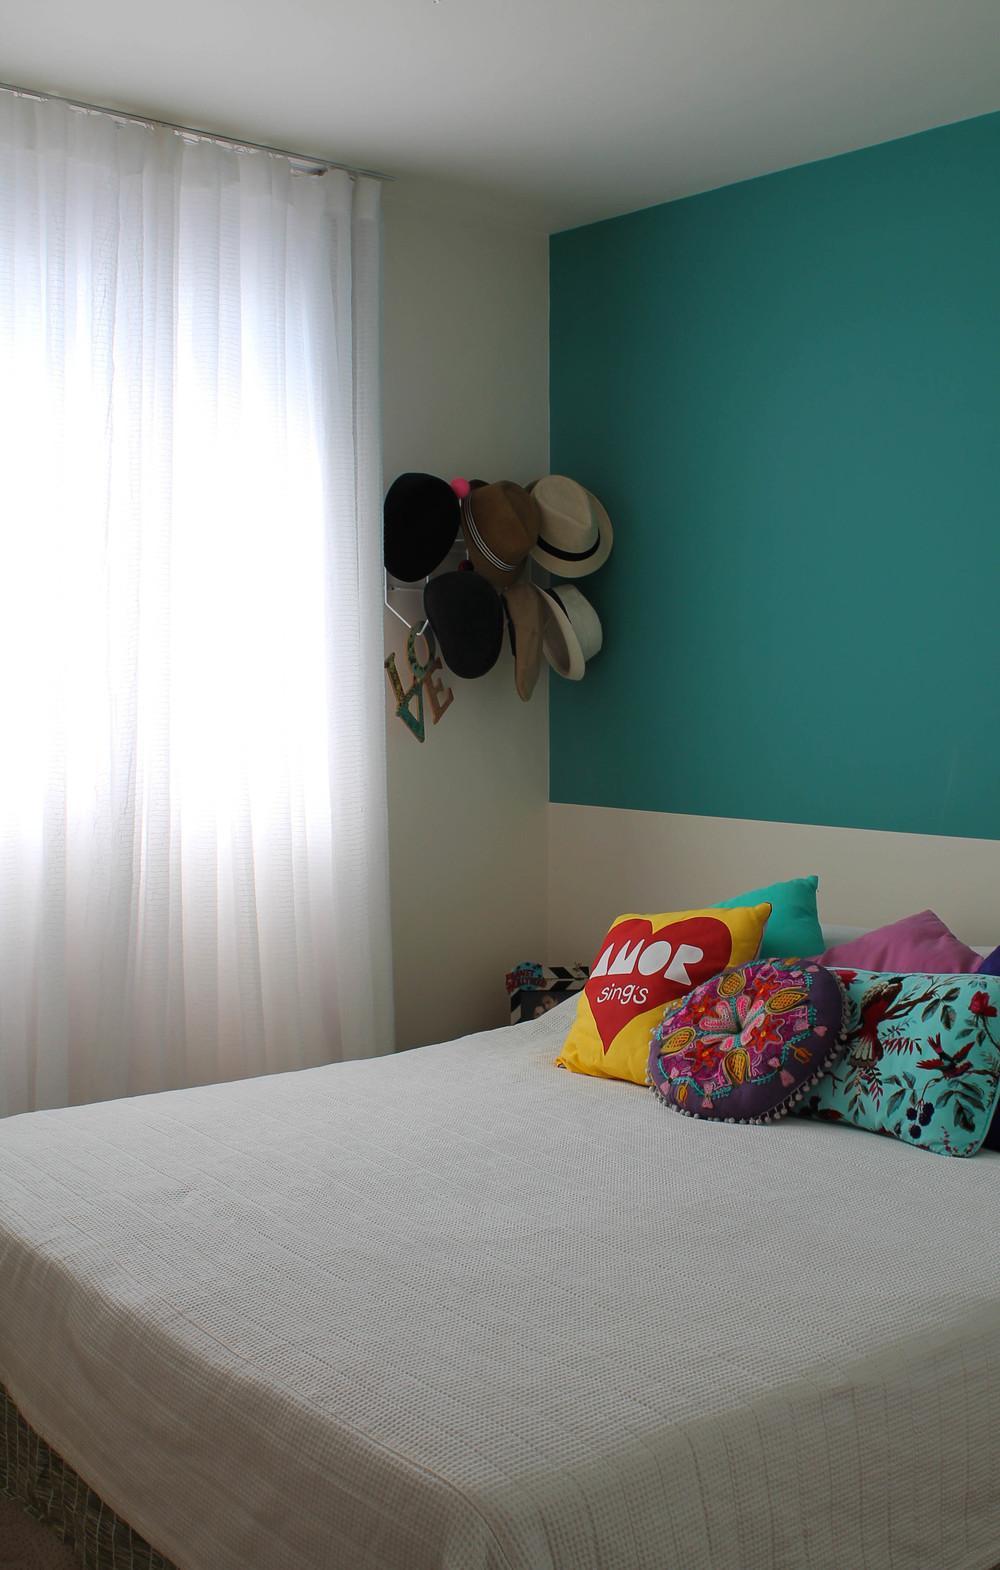 61 quartos azul turquesa tiffany fotos lindas - Azul turquesa pared ...